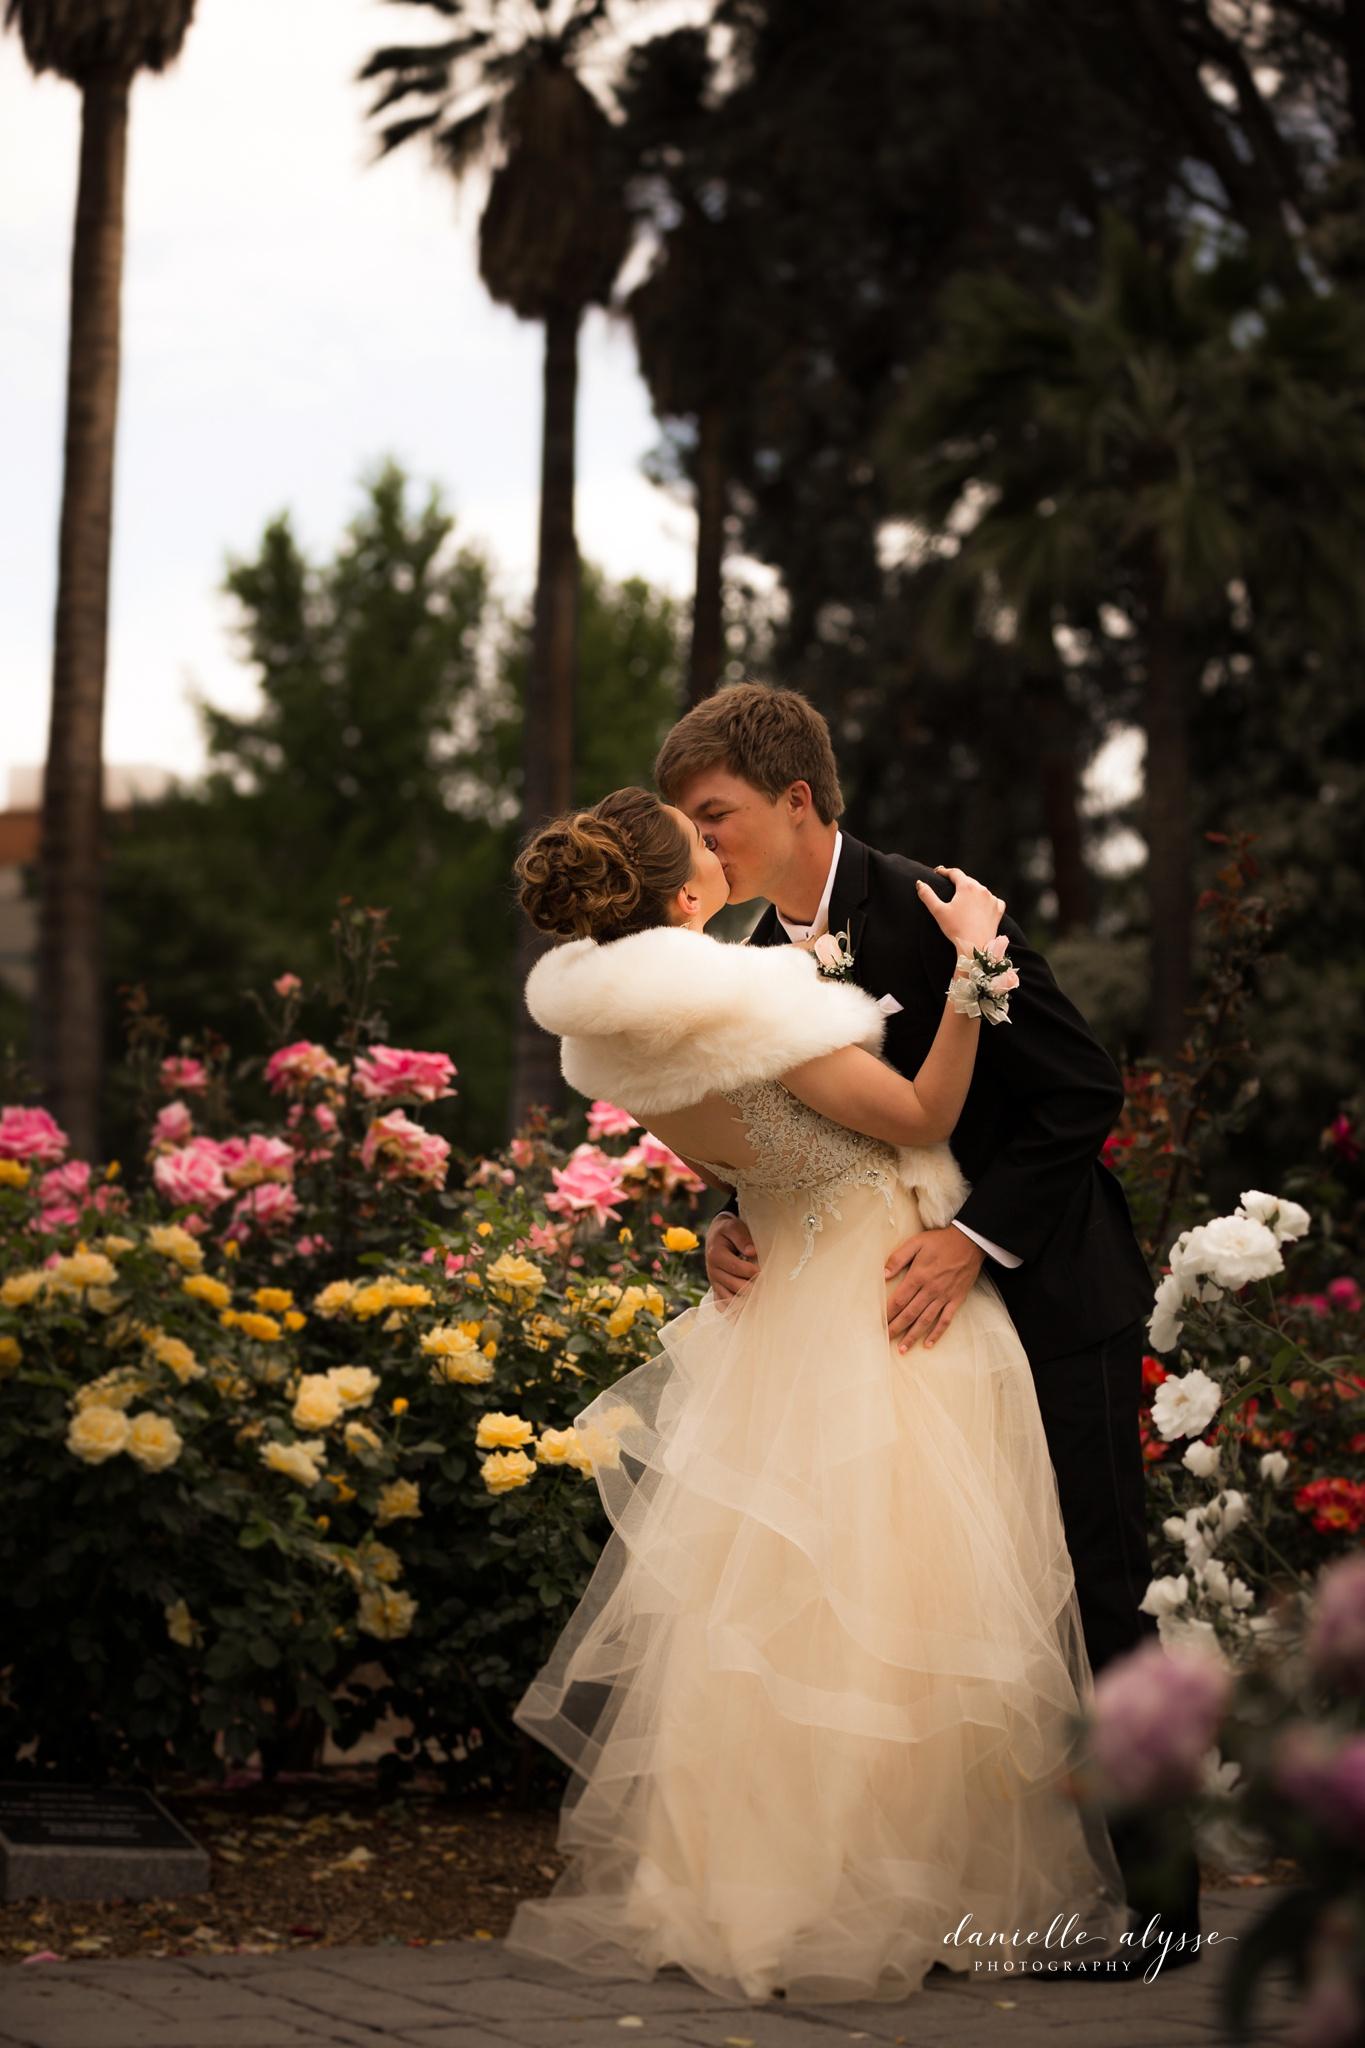 180428_prom_senior_ball_capitol_rose_danielle_alysse_photography_sacramento_photographer_blog_22_WEB.jpg